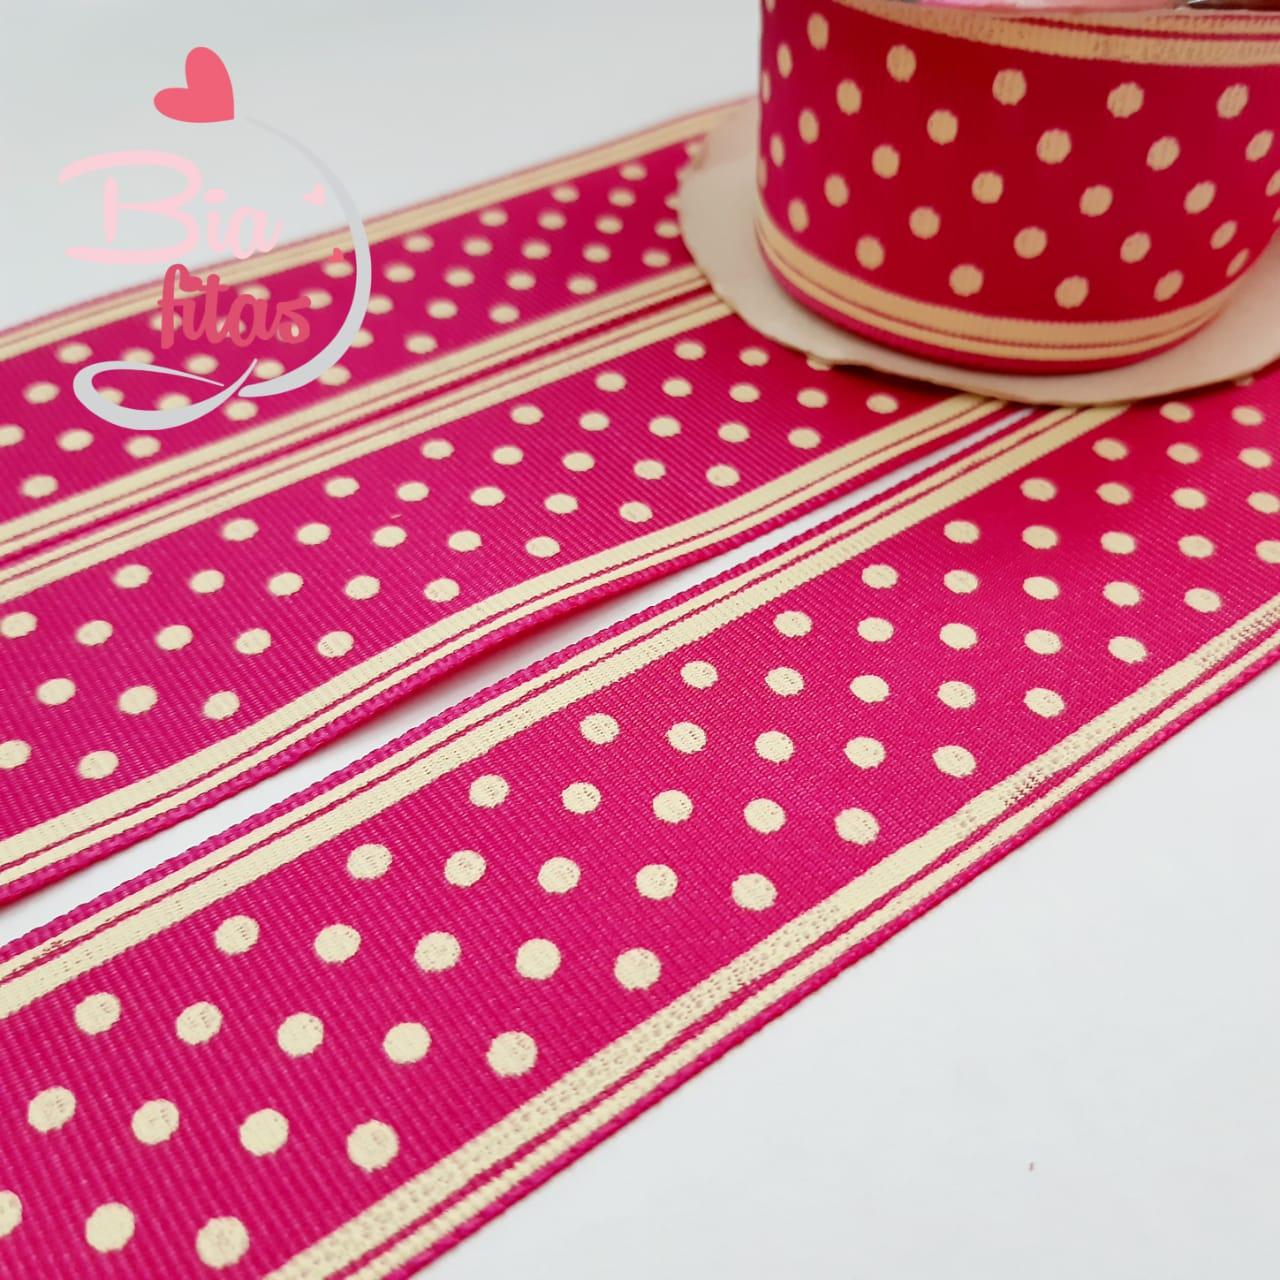 Gorgorão Sinimbú Poá Pink 38/06 - 5 metros